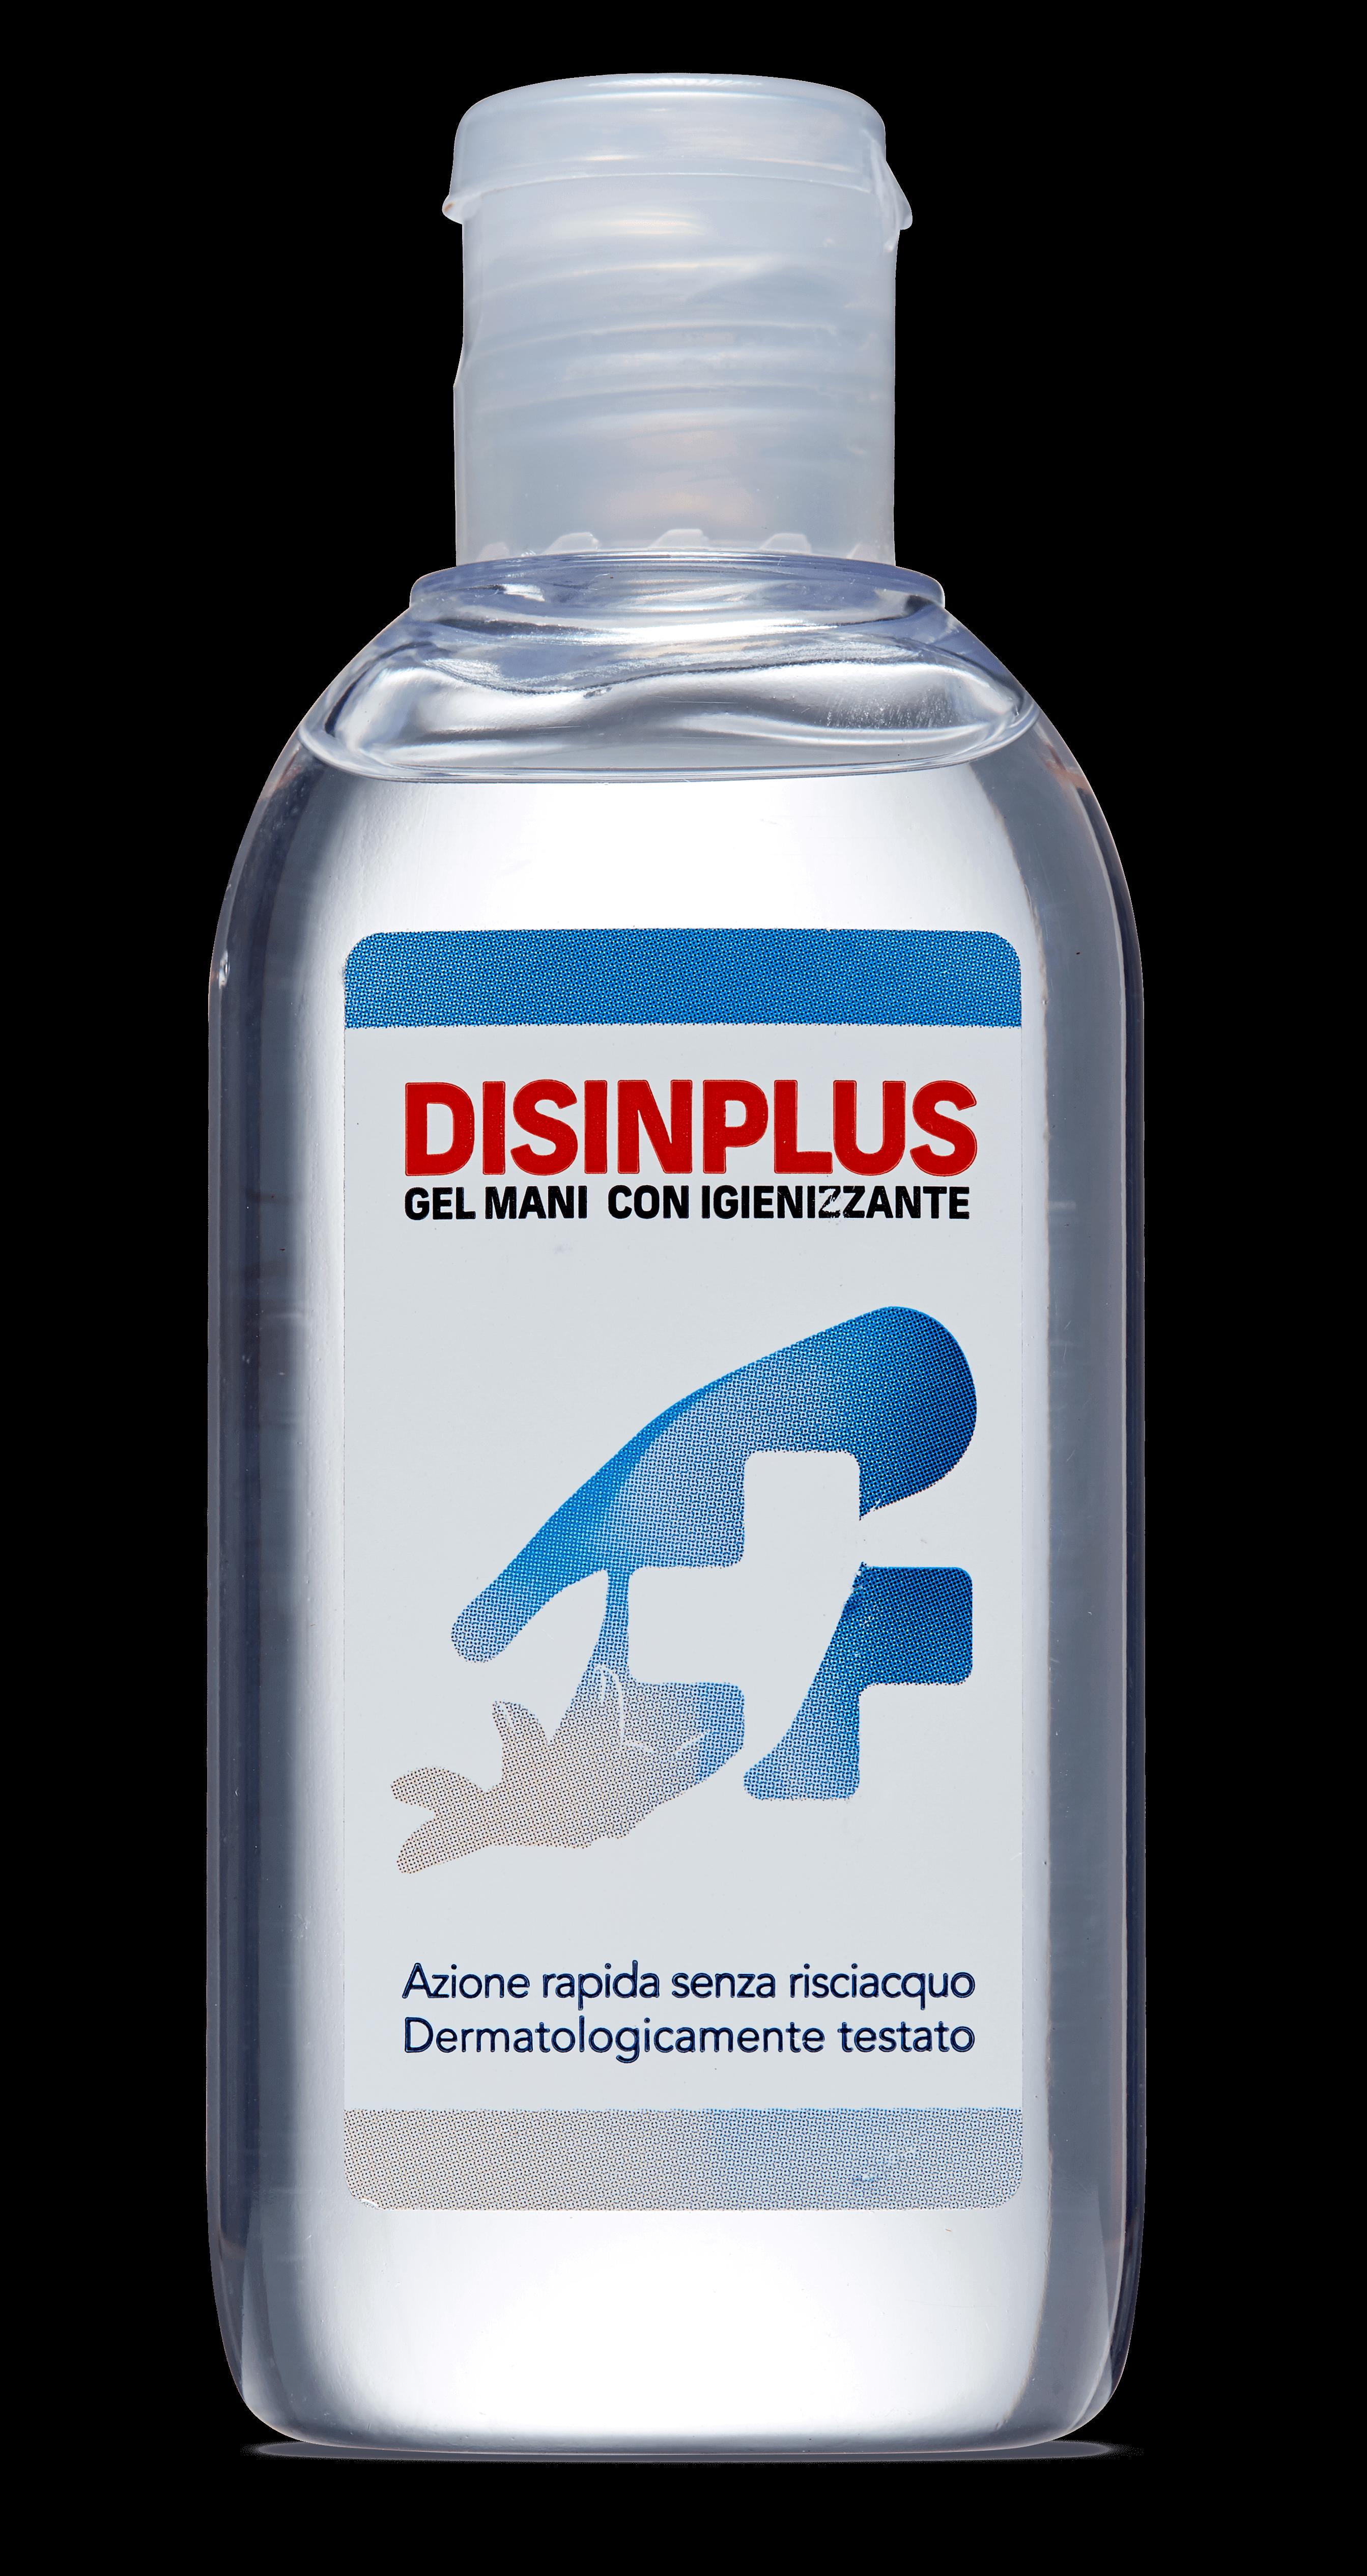 Disinplus gel mani 100ml